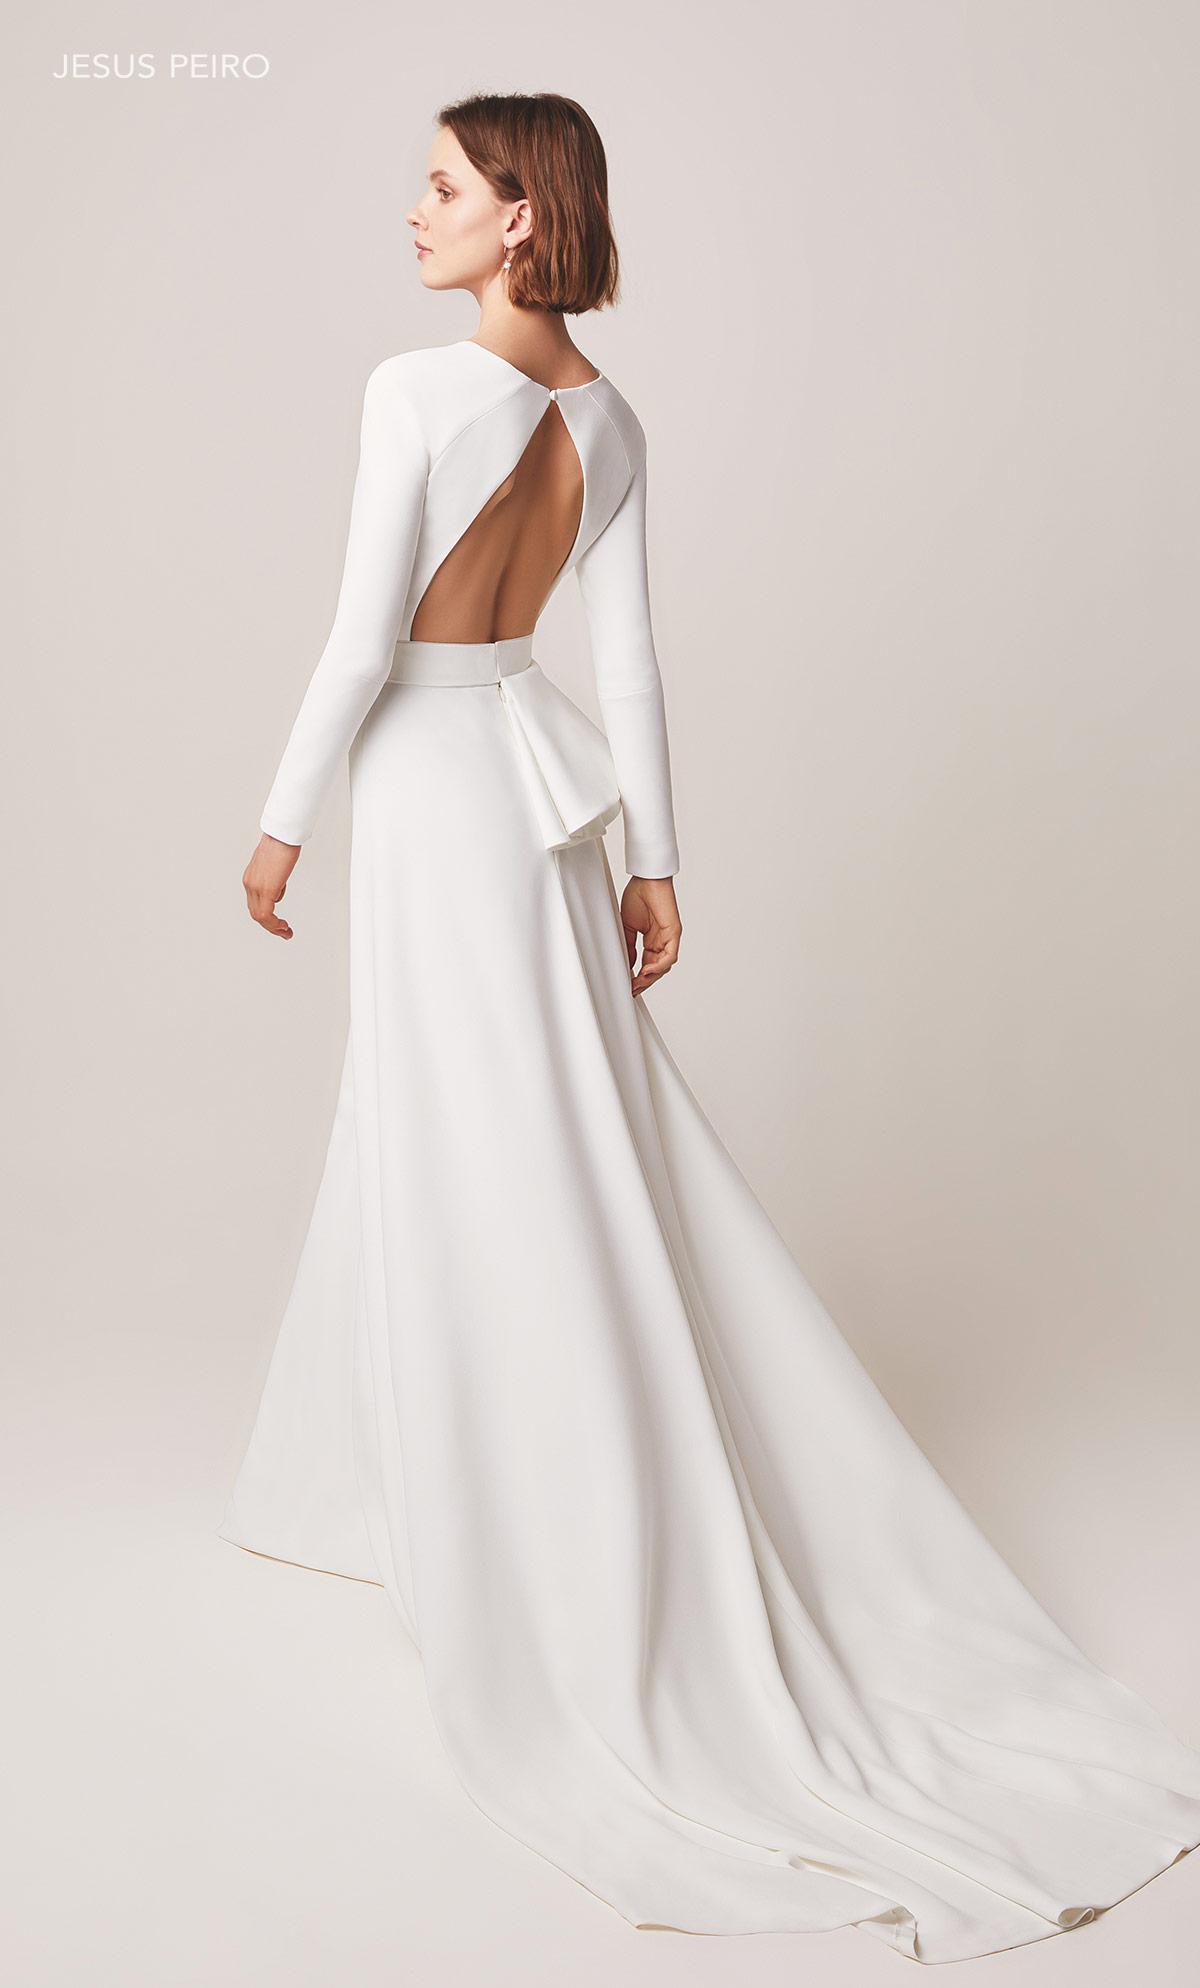 Vestido novia Jesús Peiró Ref.164